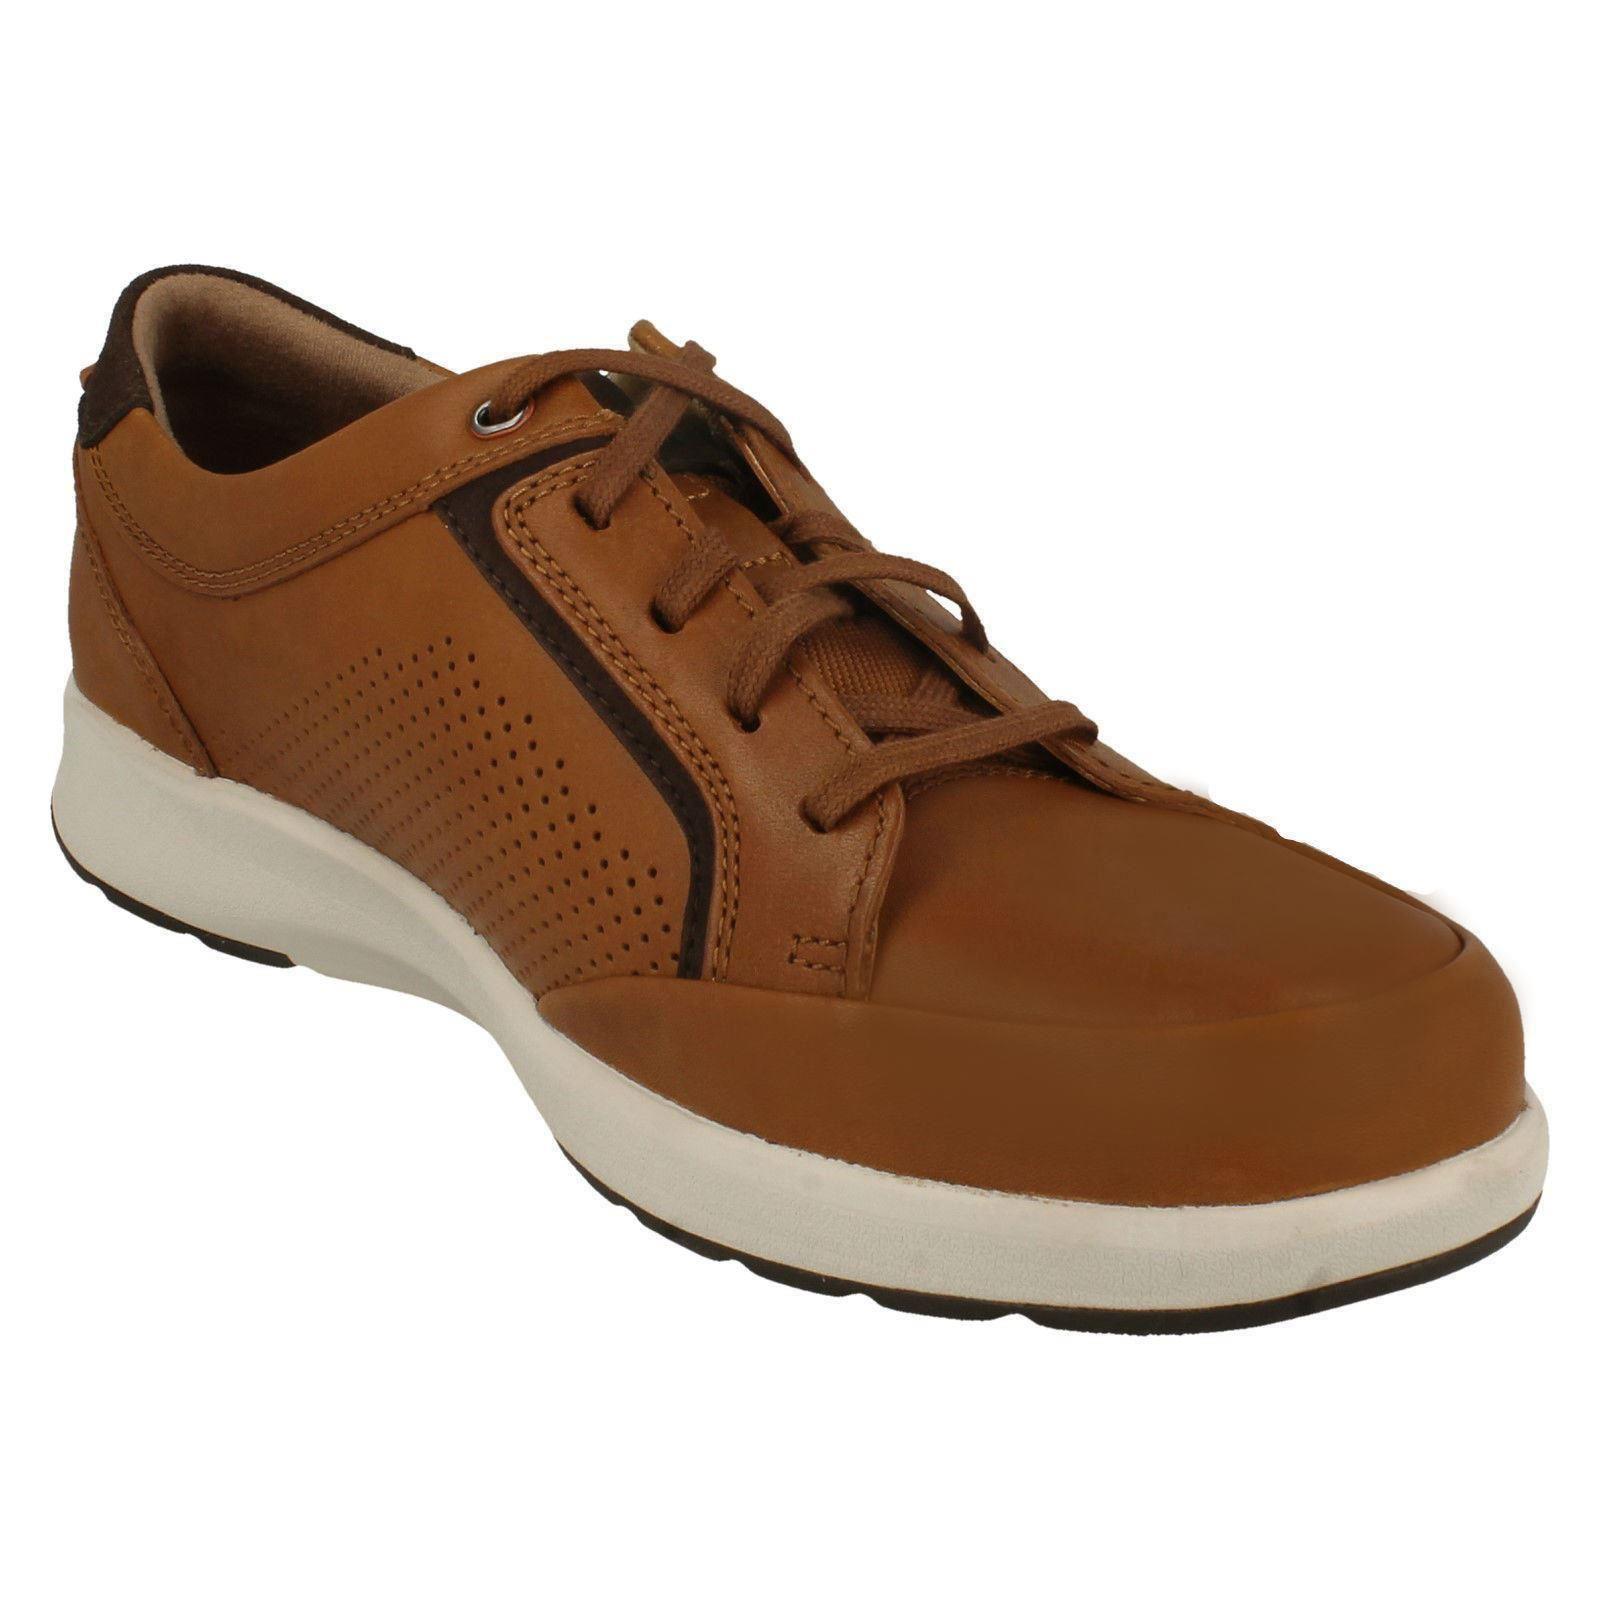 Senderismo Zapato Mens Onu Informal Clarks Form Cordones qP78wa7A